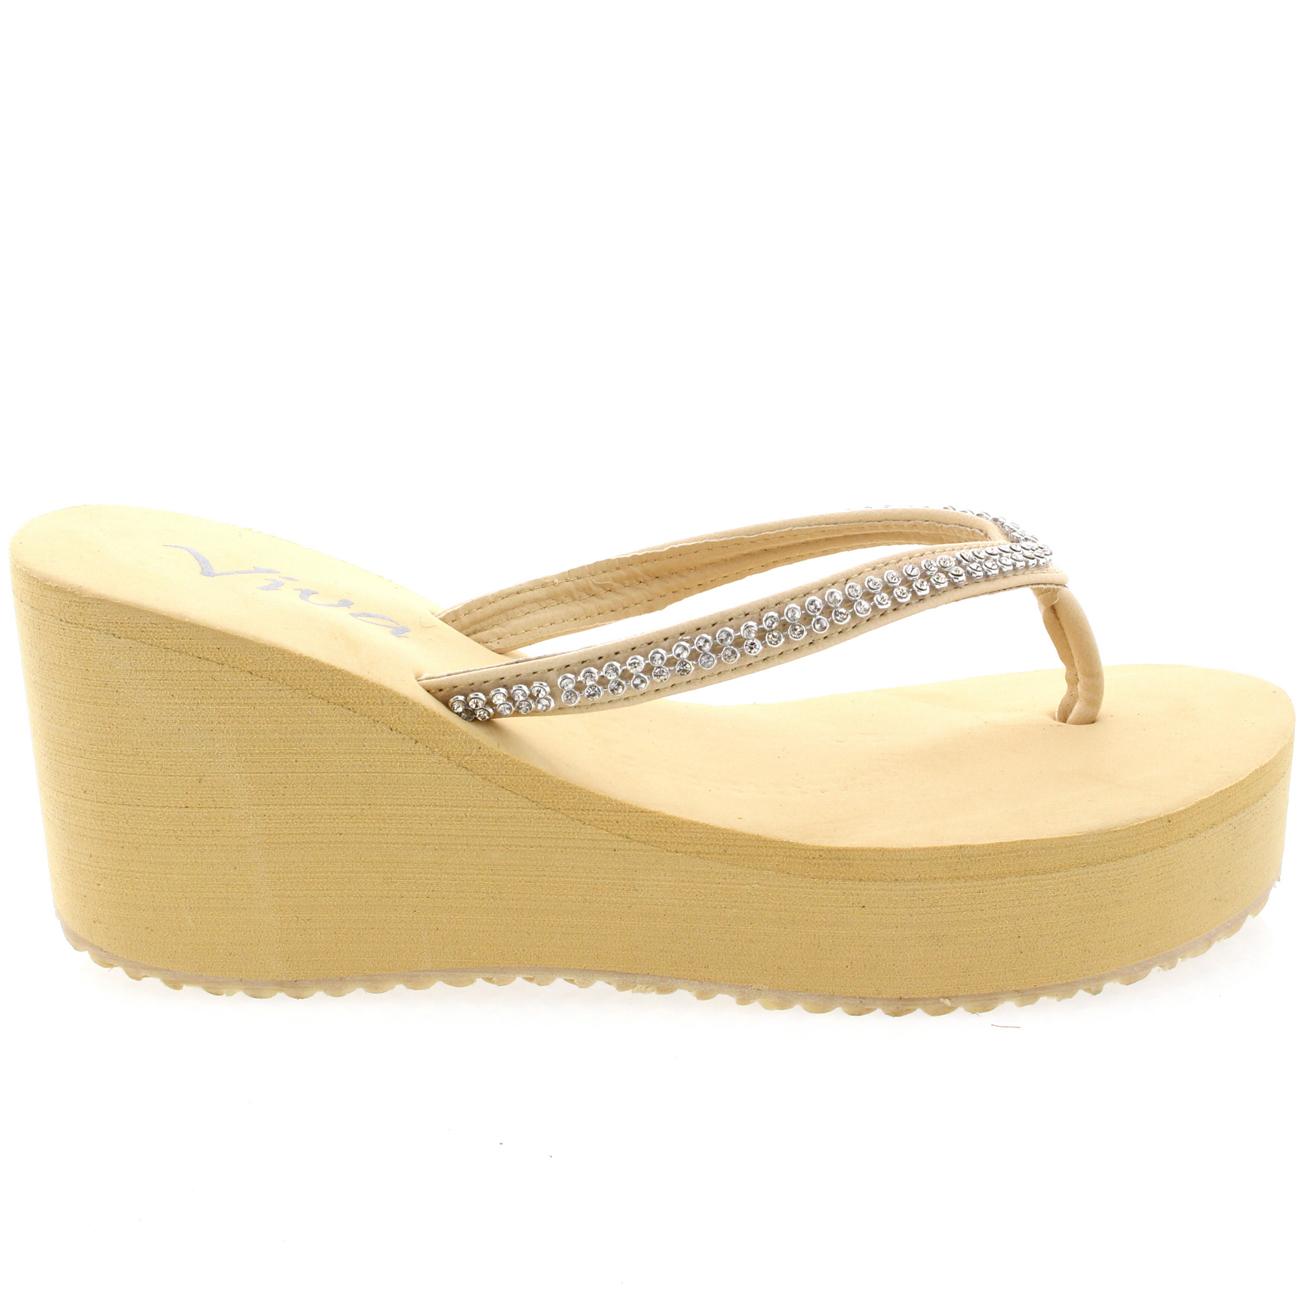 Find great deals on eBay for flip flops heels. Shop with confidence.